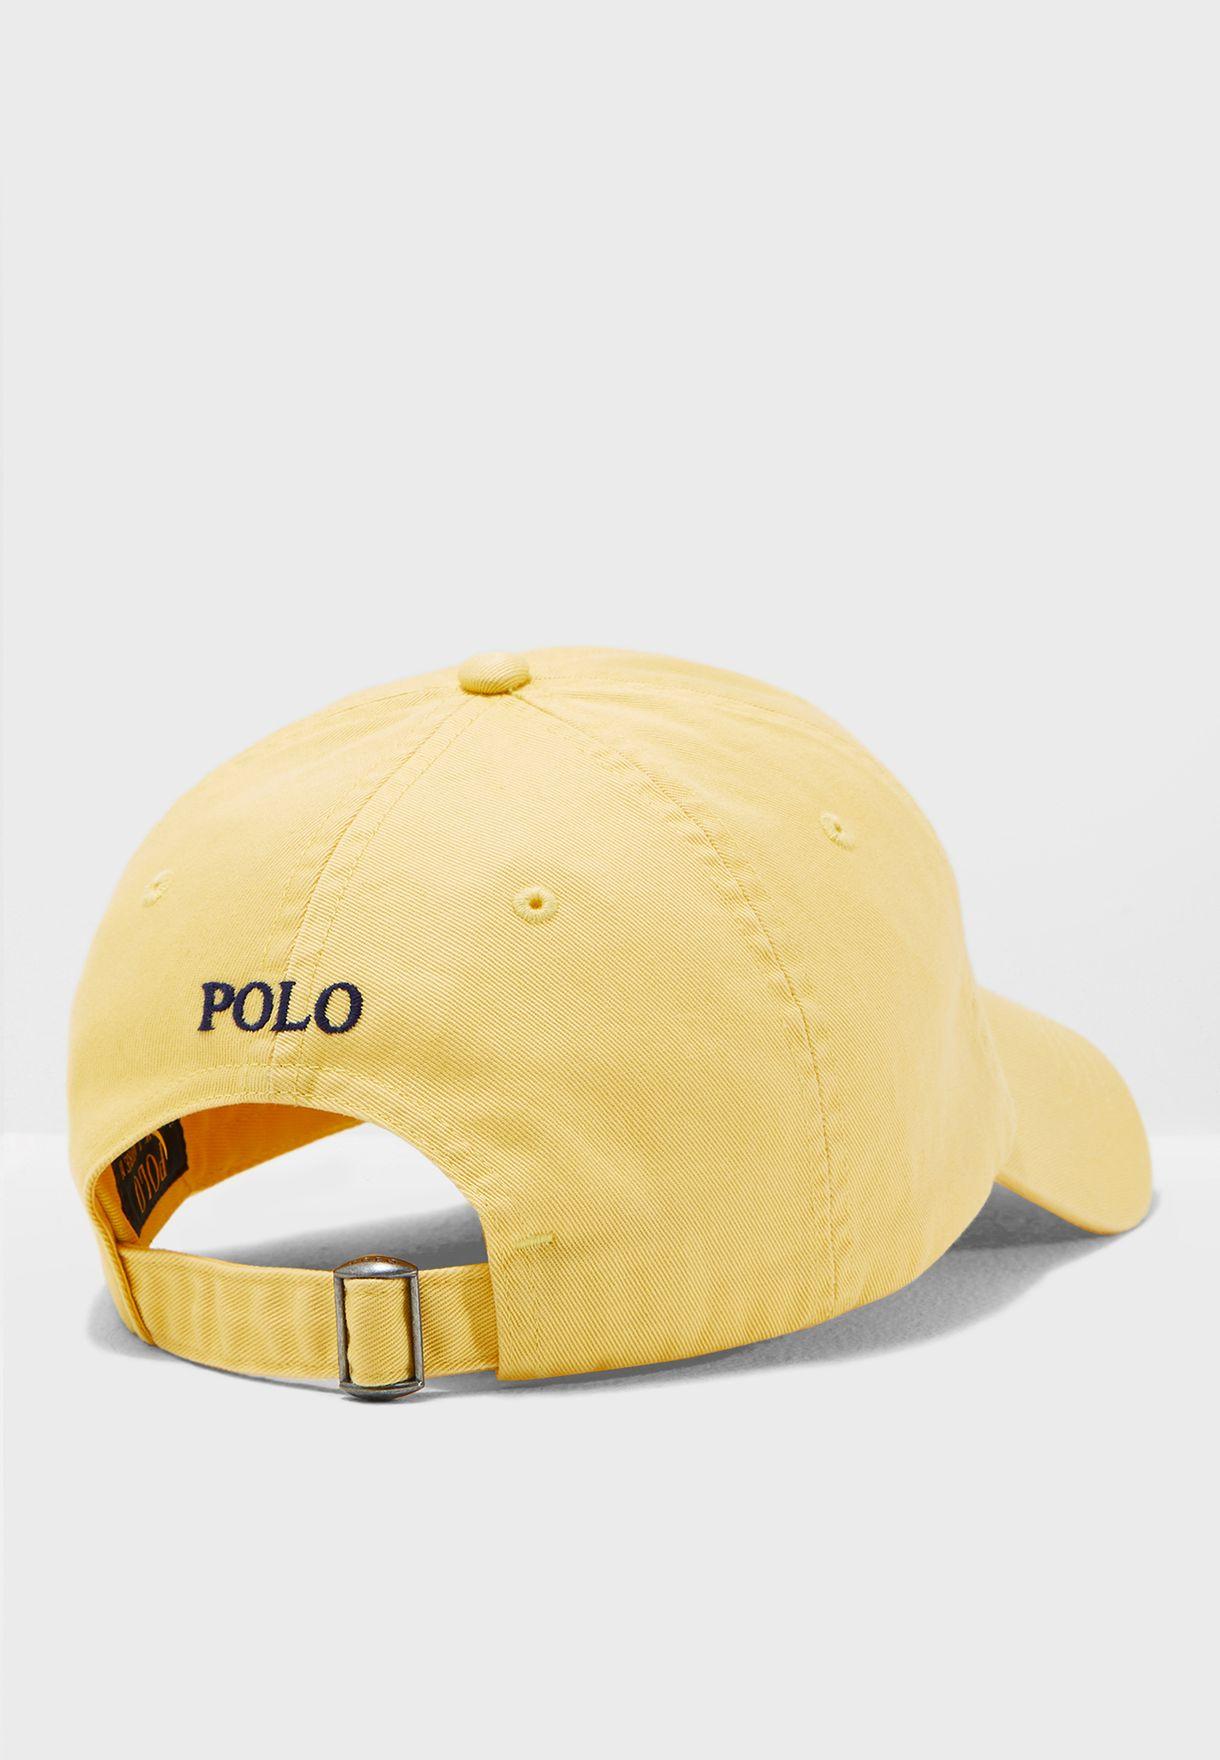 3036e011199 Shop Polo Ralph Lauren yellow Cotton Chino Baseball Cap ...